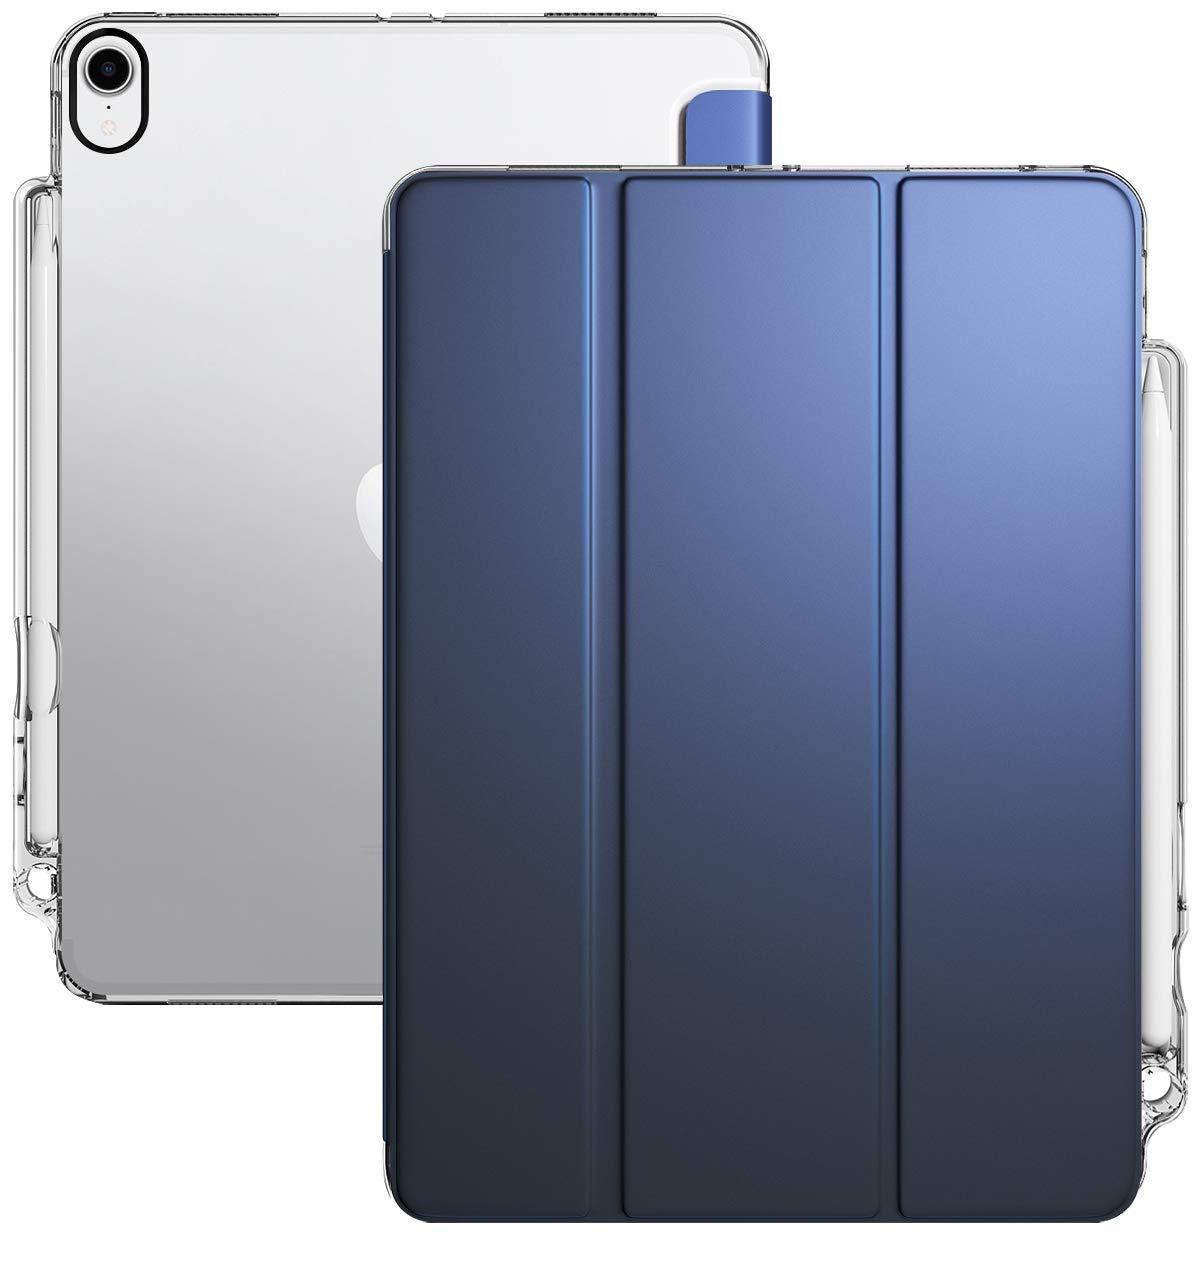 【即日発送】 Poetic Navy Lumos X Navy Apple iPad Pro 11用 2018年発売 LumosX-iPad-Pro-11-2018-Black iPad B07GNRPK2C Navy Blue/Clear Navy Blue/Clear, イナカダテムラ:ed00cd59 --- arianechie.dominiotemporario.com